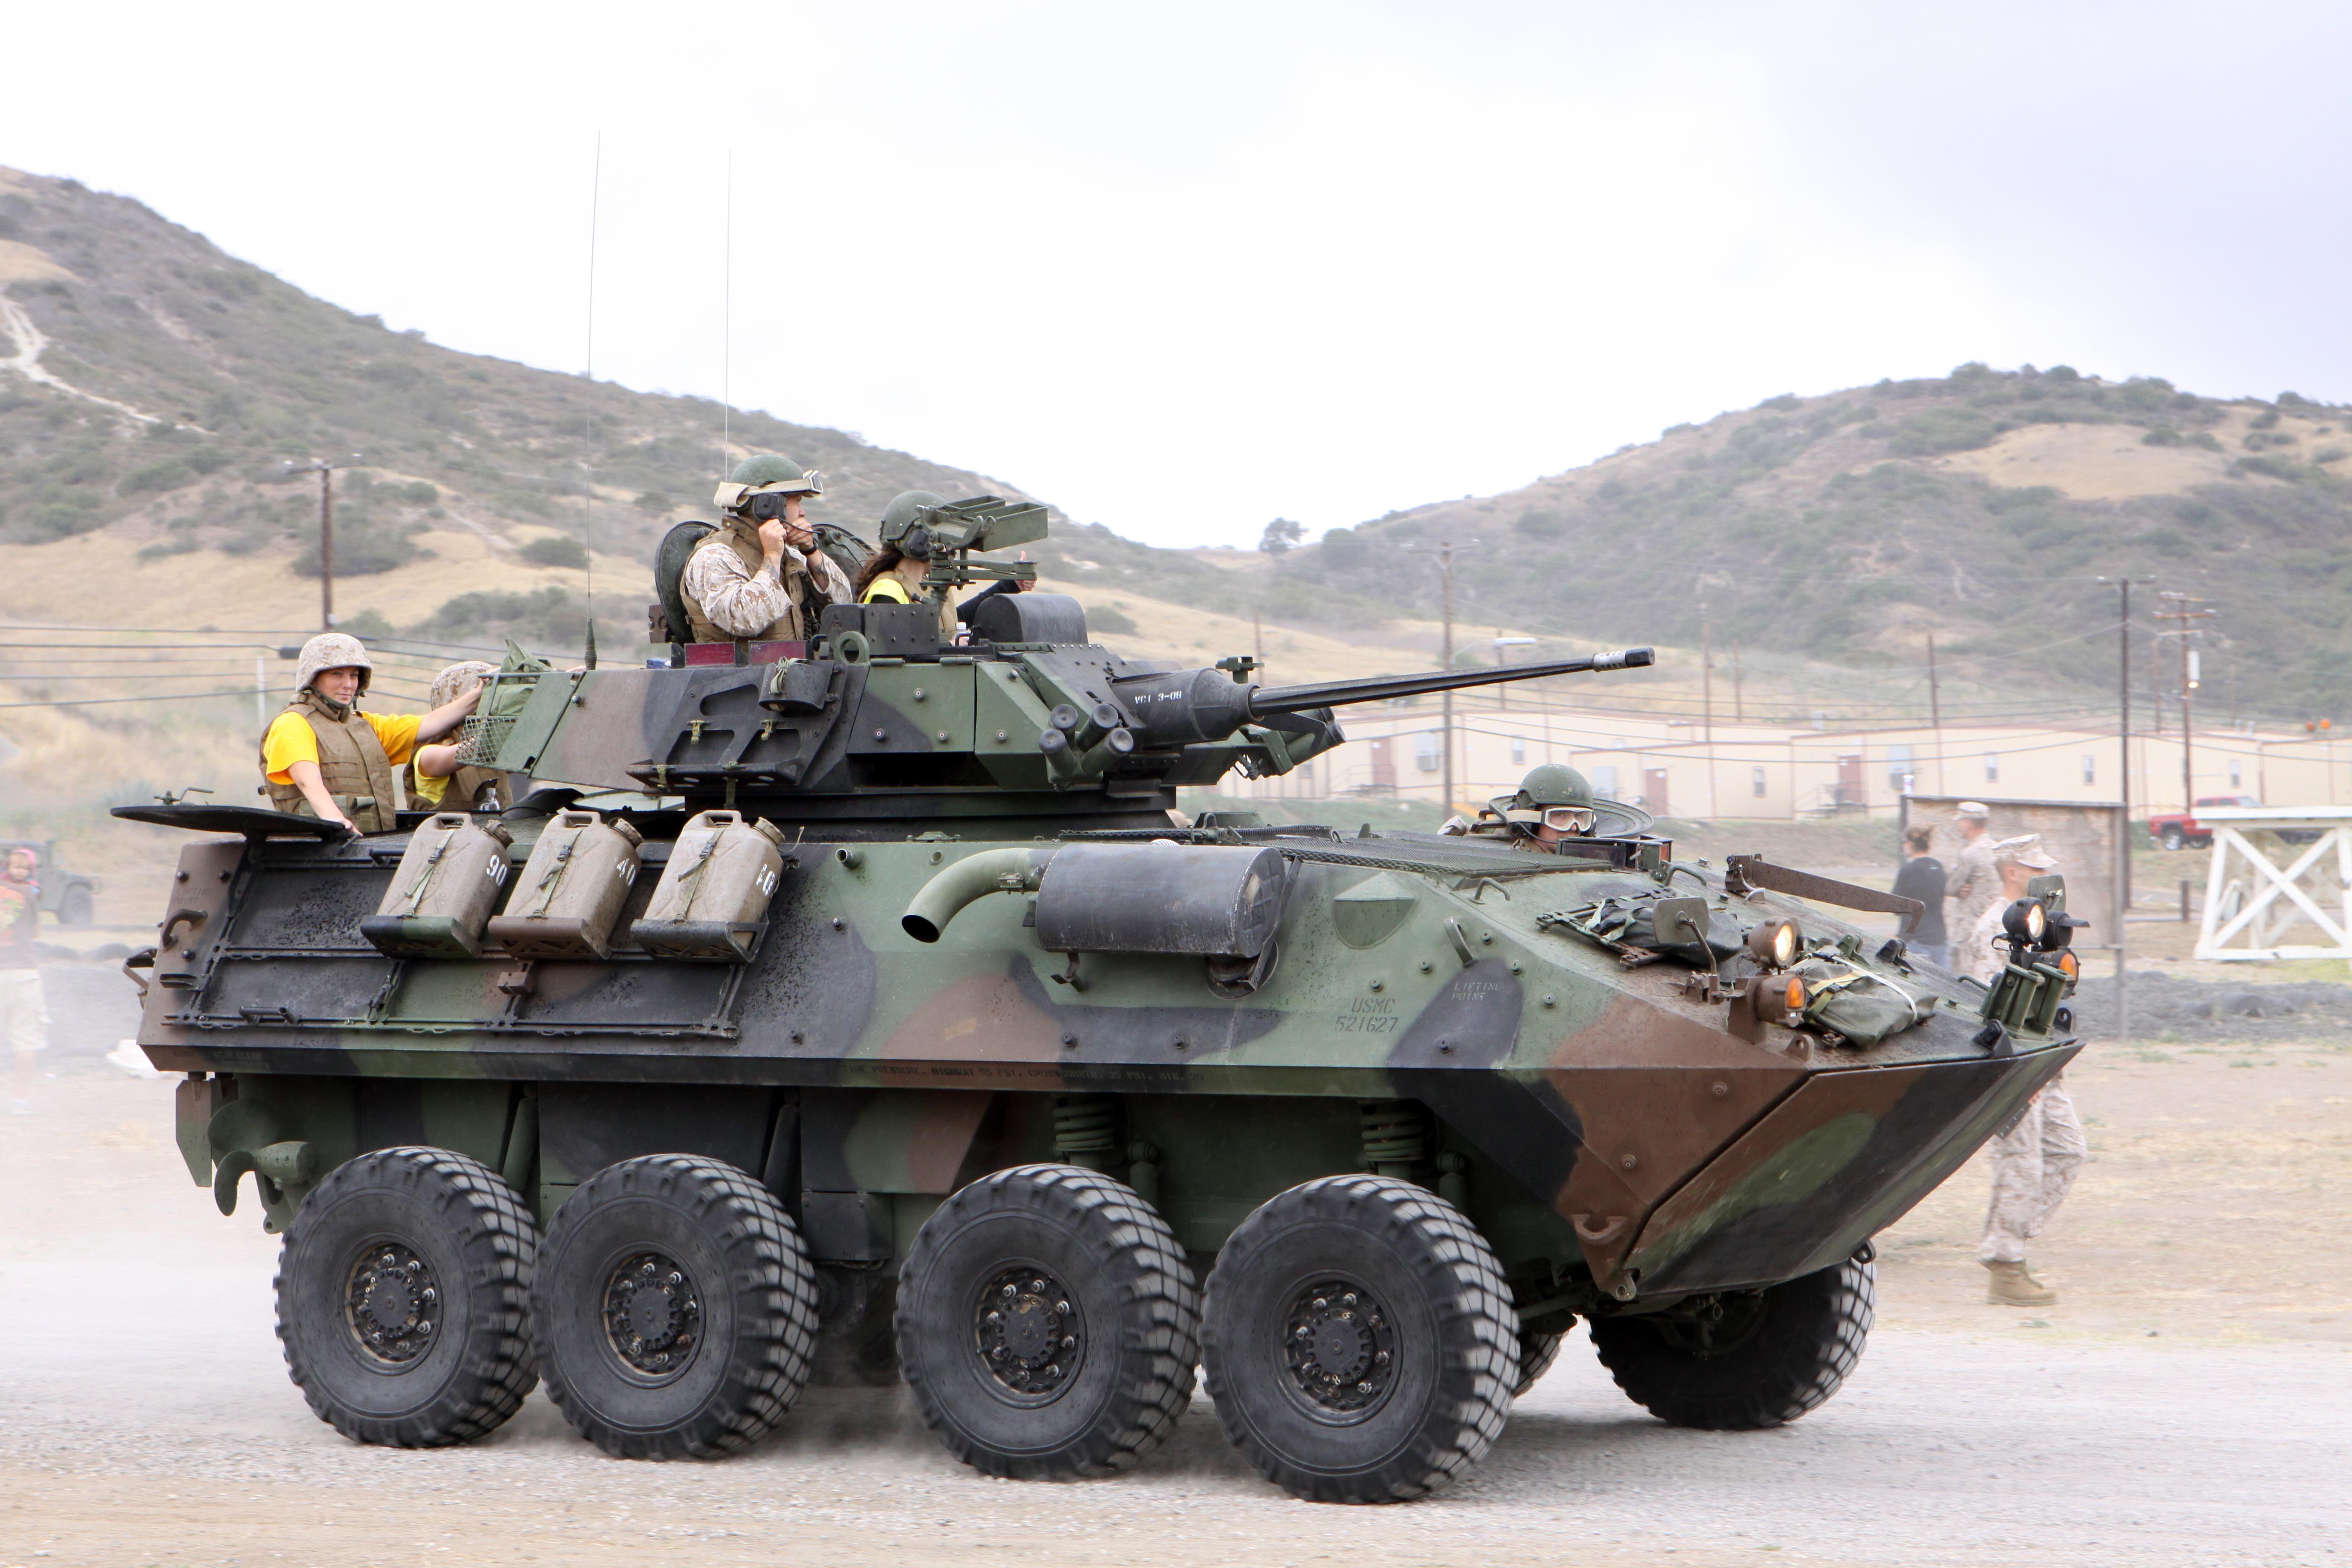 File:Light Armored Vehicle.JPG  Wikipedia, the free encyclopedia